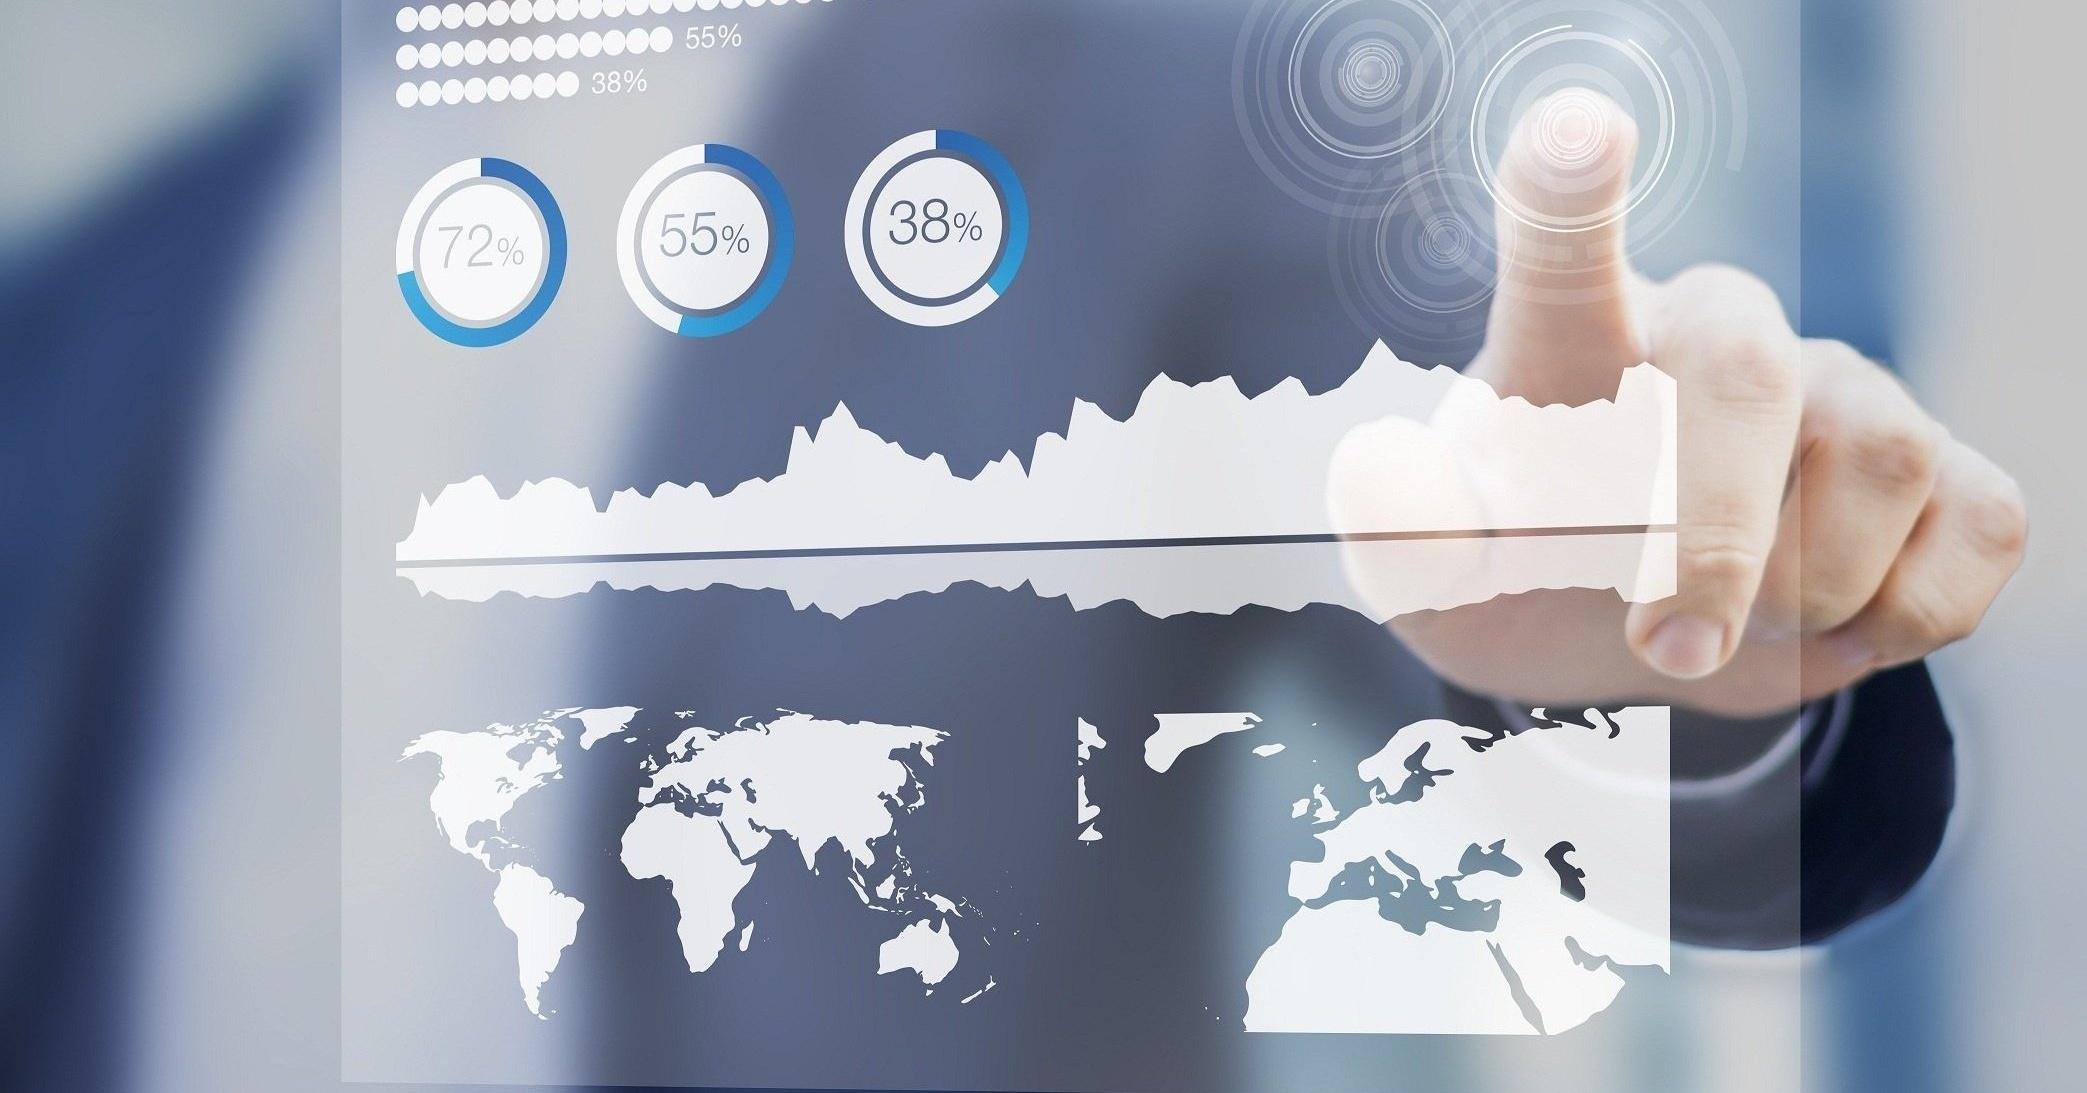 Transparenz Effizienz Logistik Produktivität Personaleinsatz